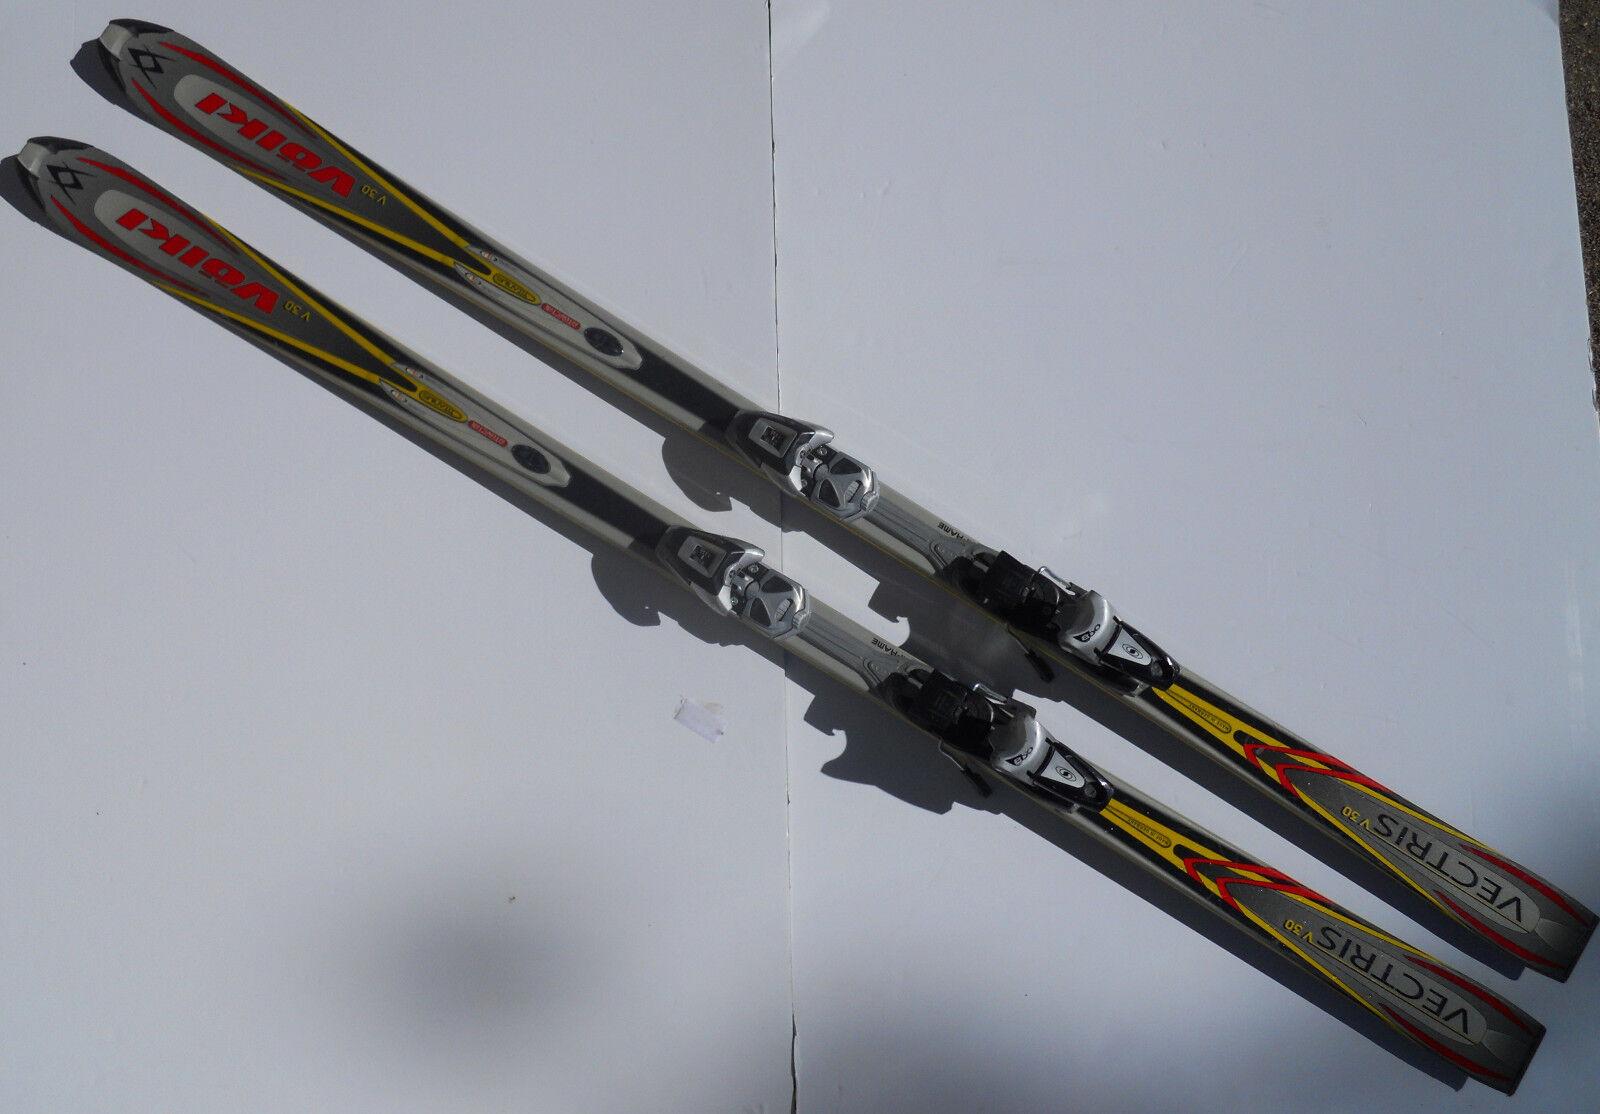 VOLKI  Vectris V30 Skis 72 Inches long (approx 190cm) with Salomon Bindings